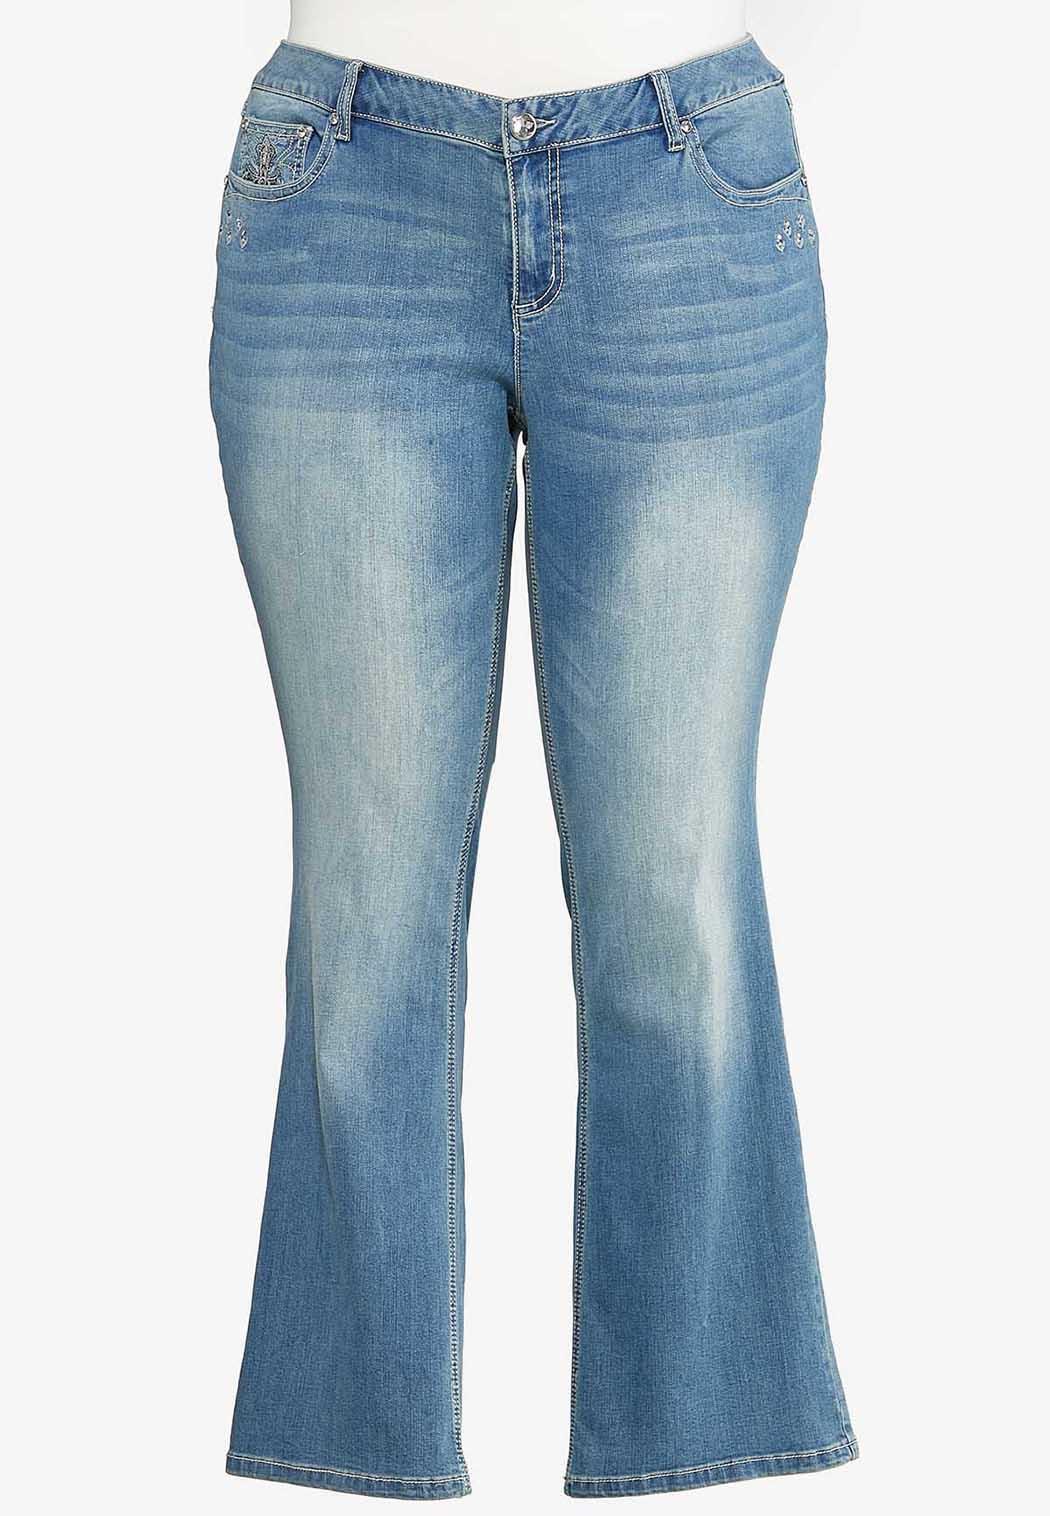 Plus Petite Cross Pocket Jeans (Item #44097766)